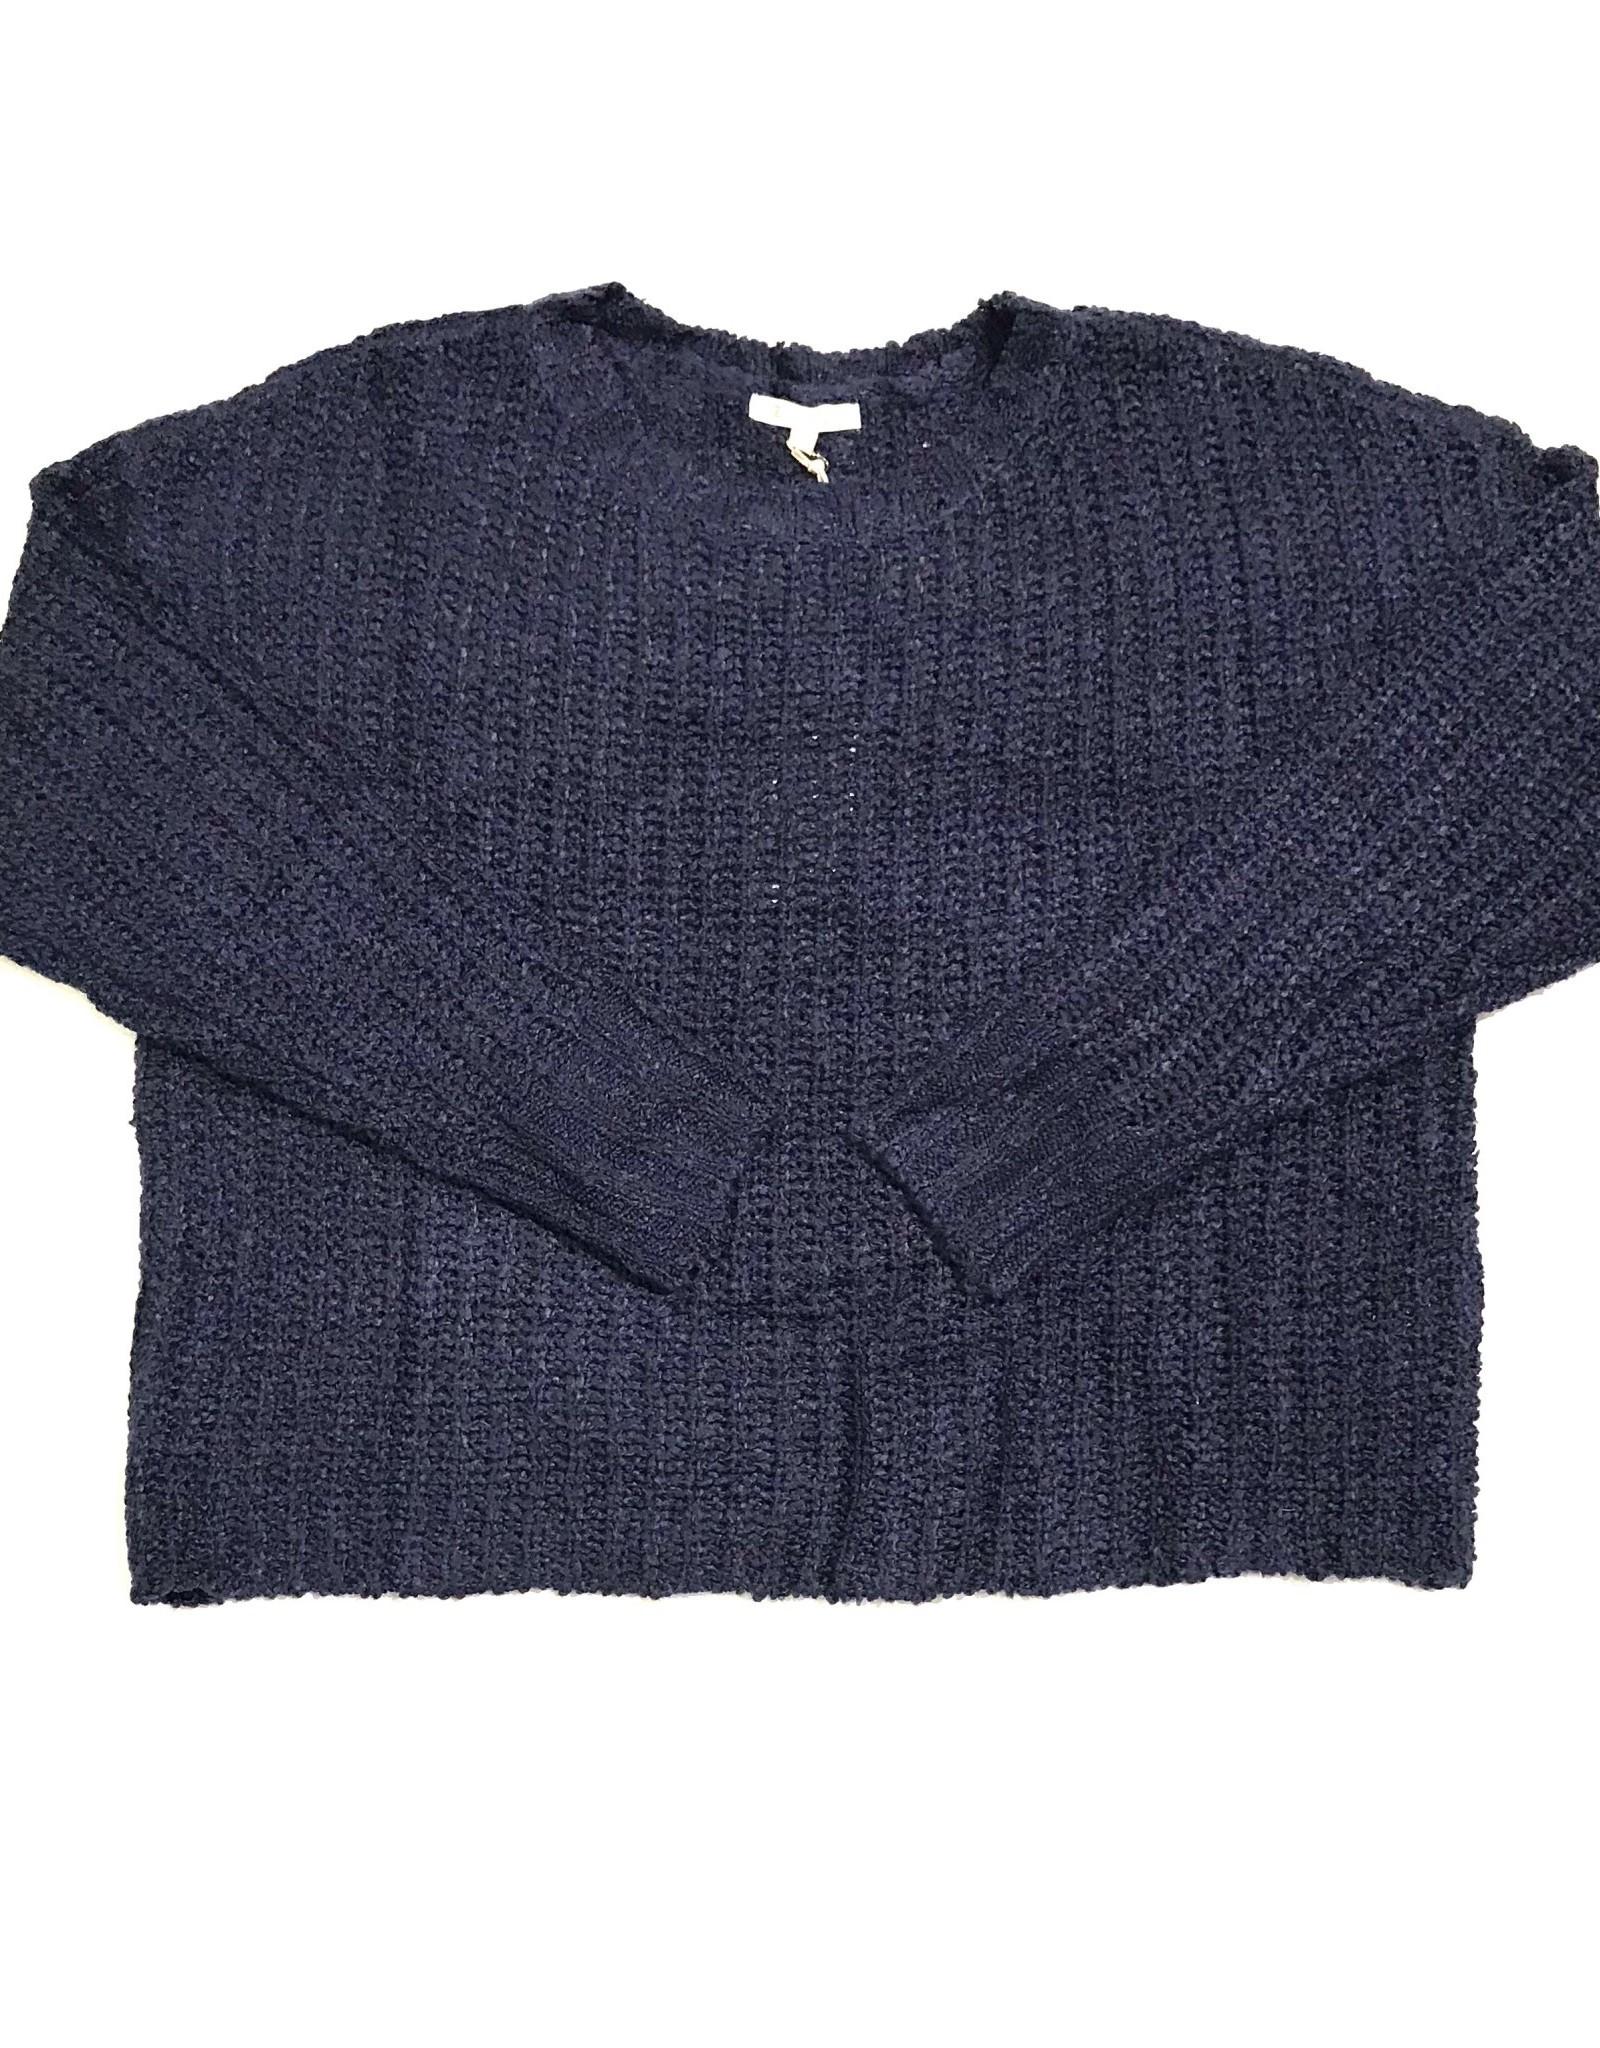 ZS Camden crew sweater ZW214483